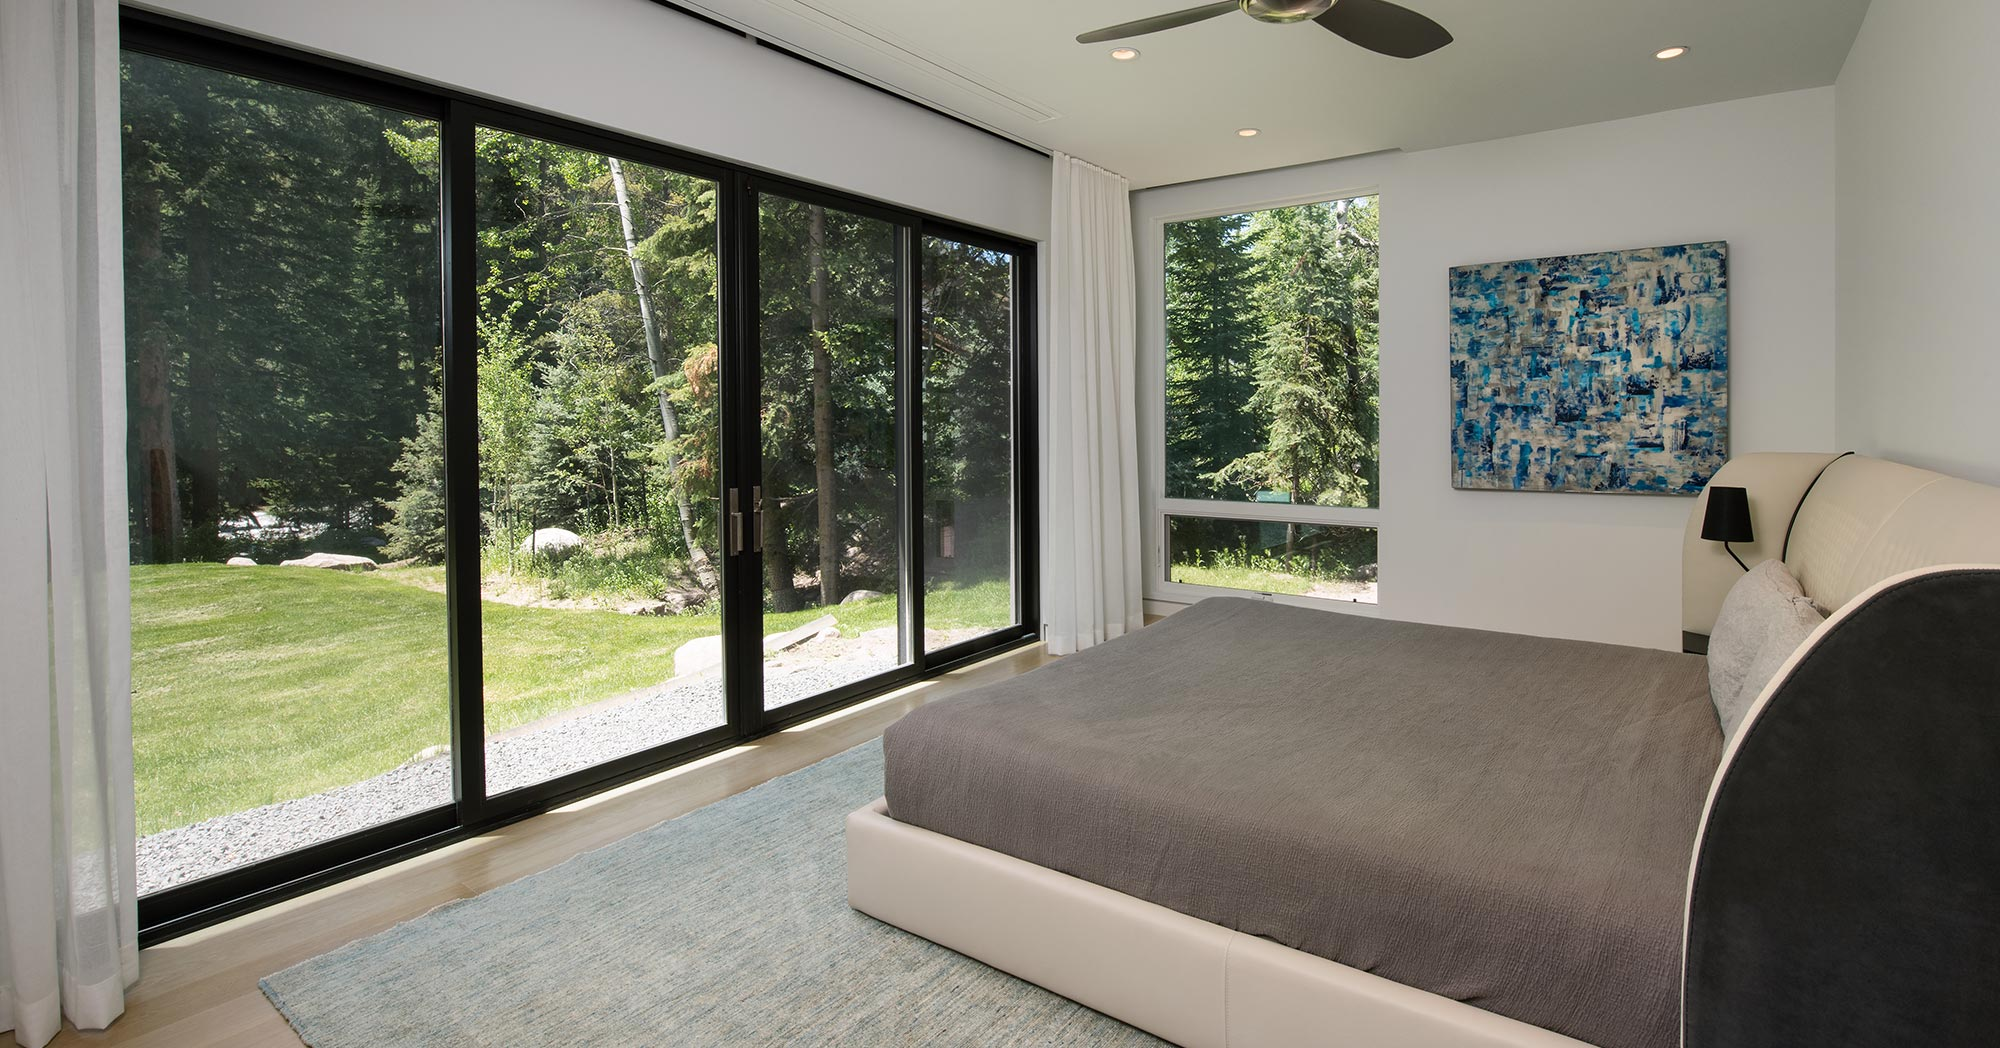 Vail Alpine Bedroom Construction